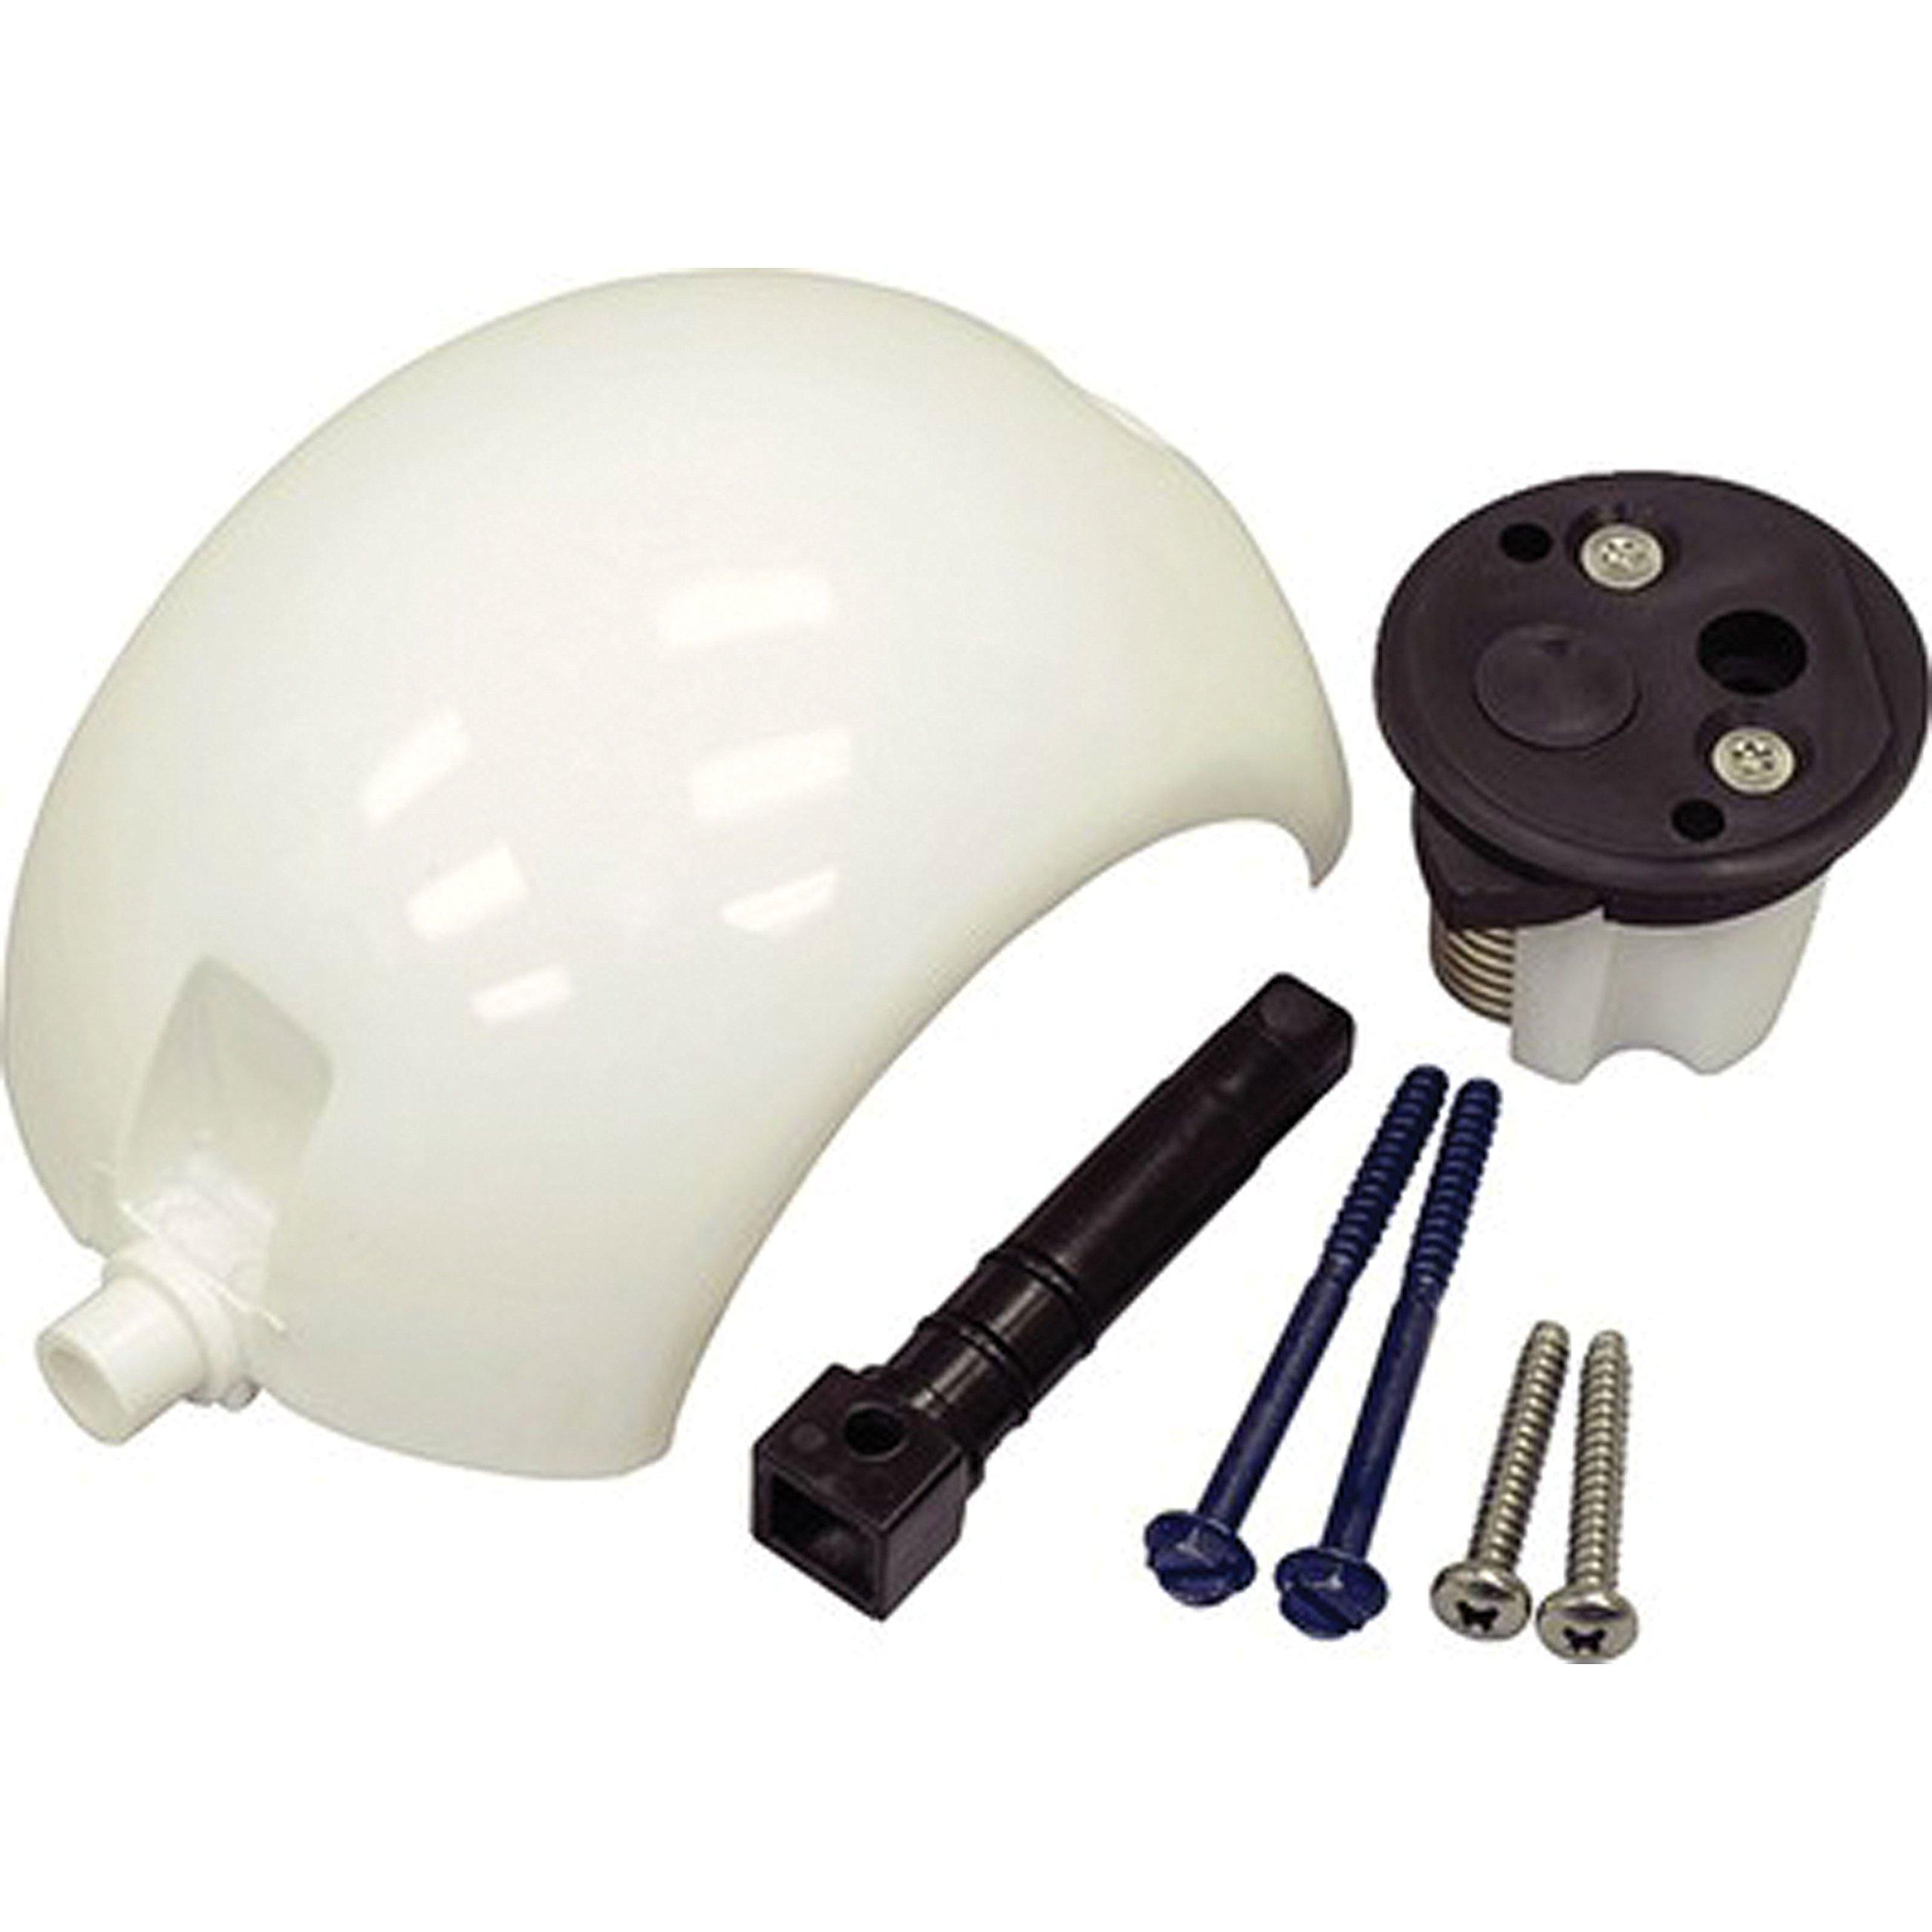 Dometic SE310681 Toilet Flush Ball Kit by Dometic